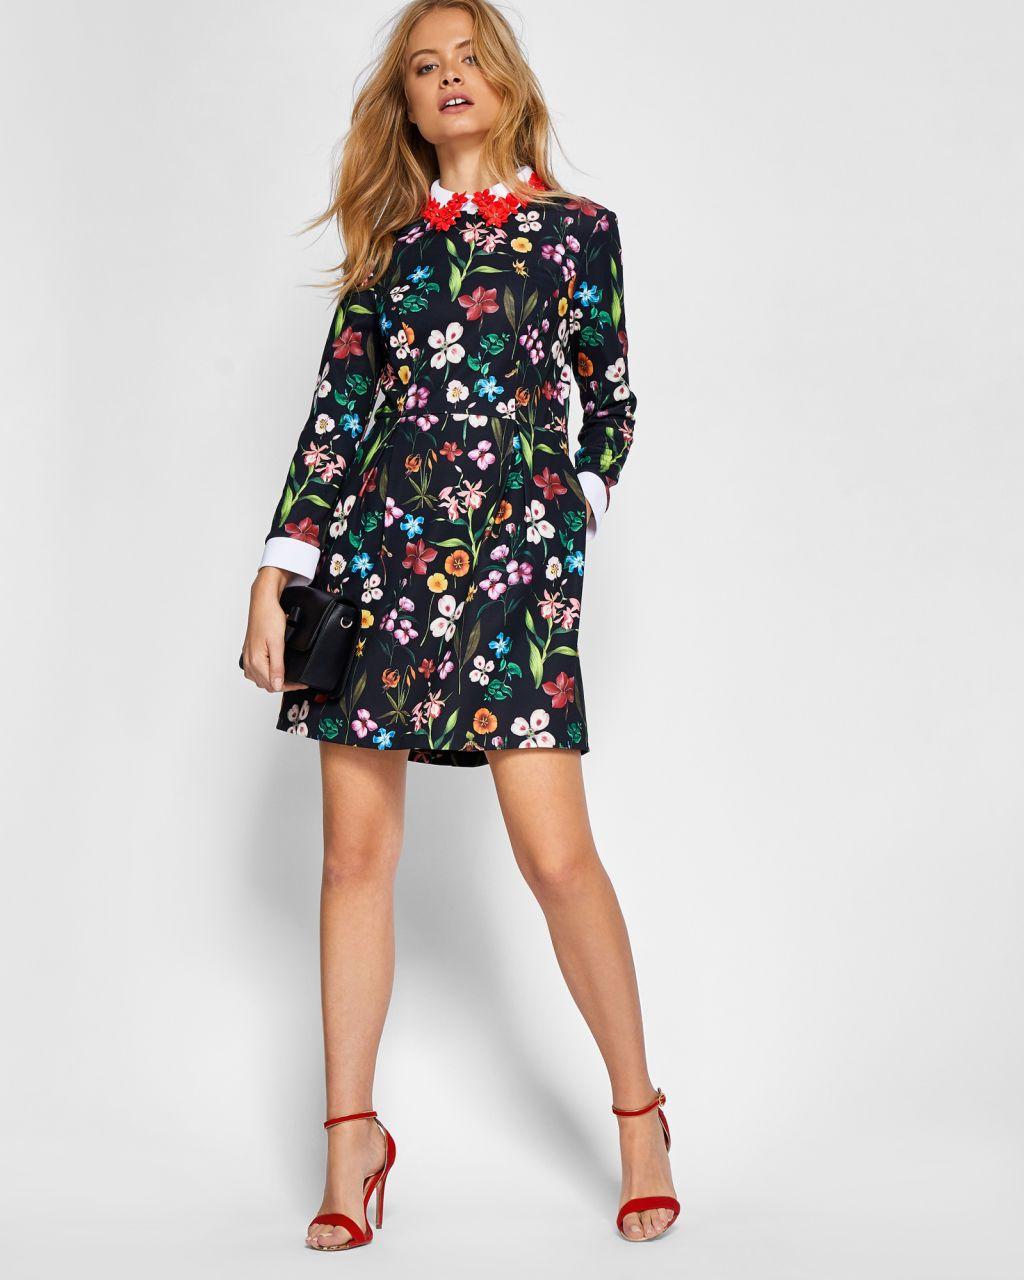 8e766213fc Hampton Court appliqued collar dress - Black